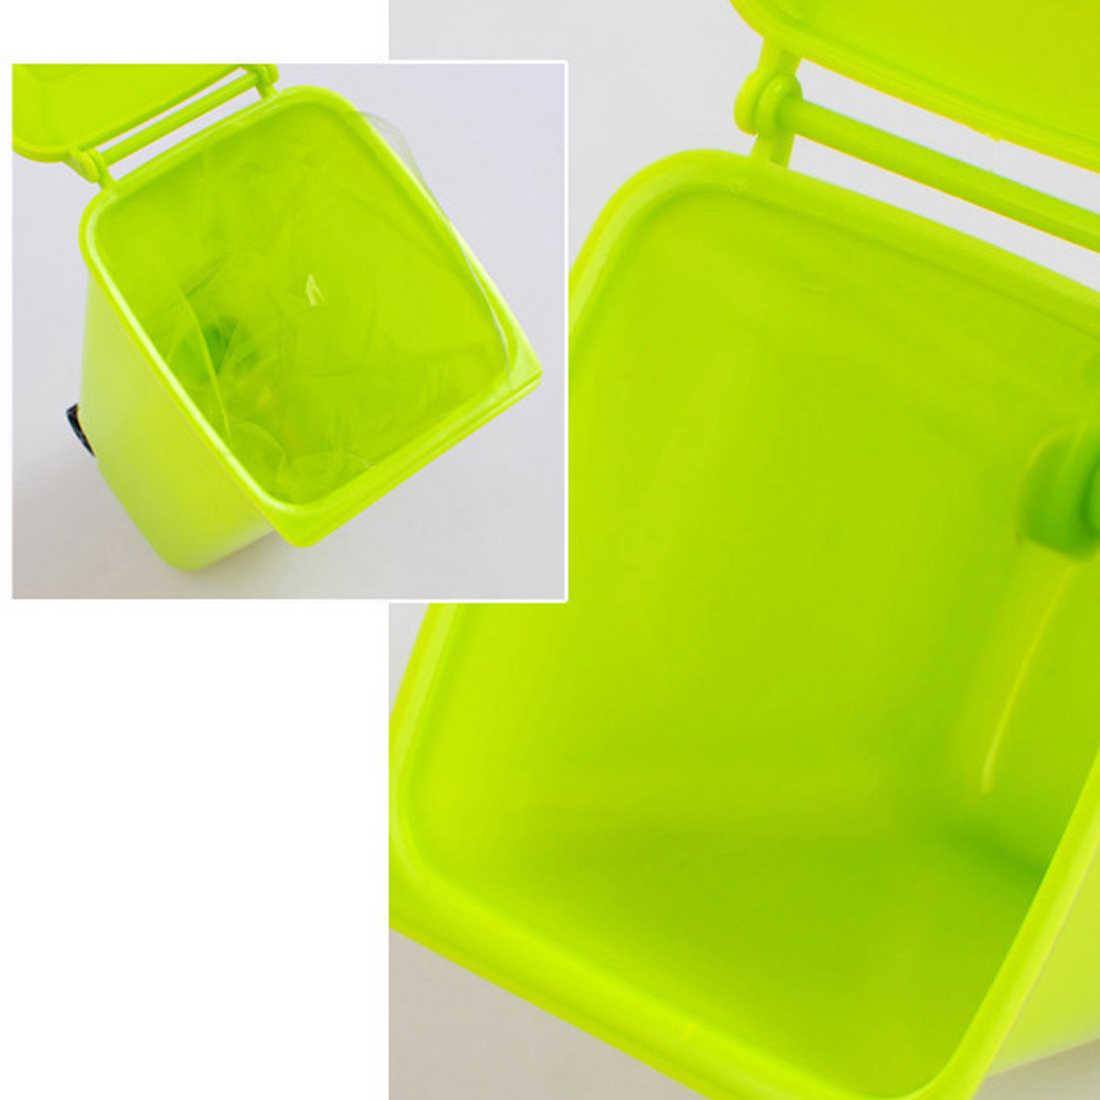 Balde de lixo Colorido Lata de lixo e Reciclagem De Alta qualidade Mini Caixa De Armazenamento De Caneta Titular para casa ou ao ar livre